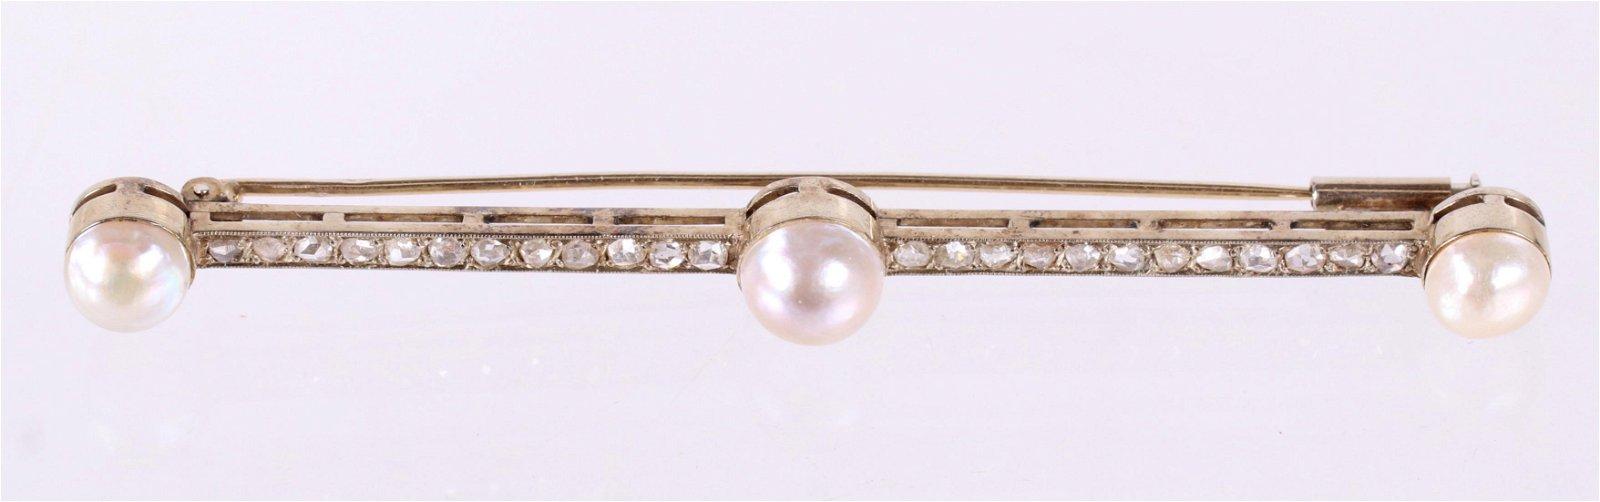 A Gold Bar Pin, Rose Cut Diamonds and Pearls